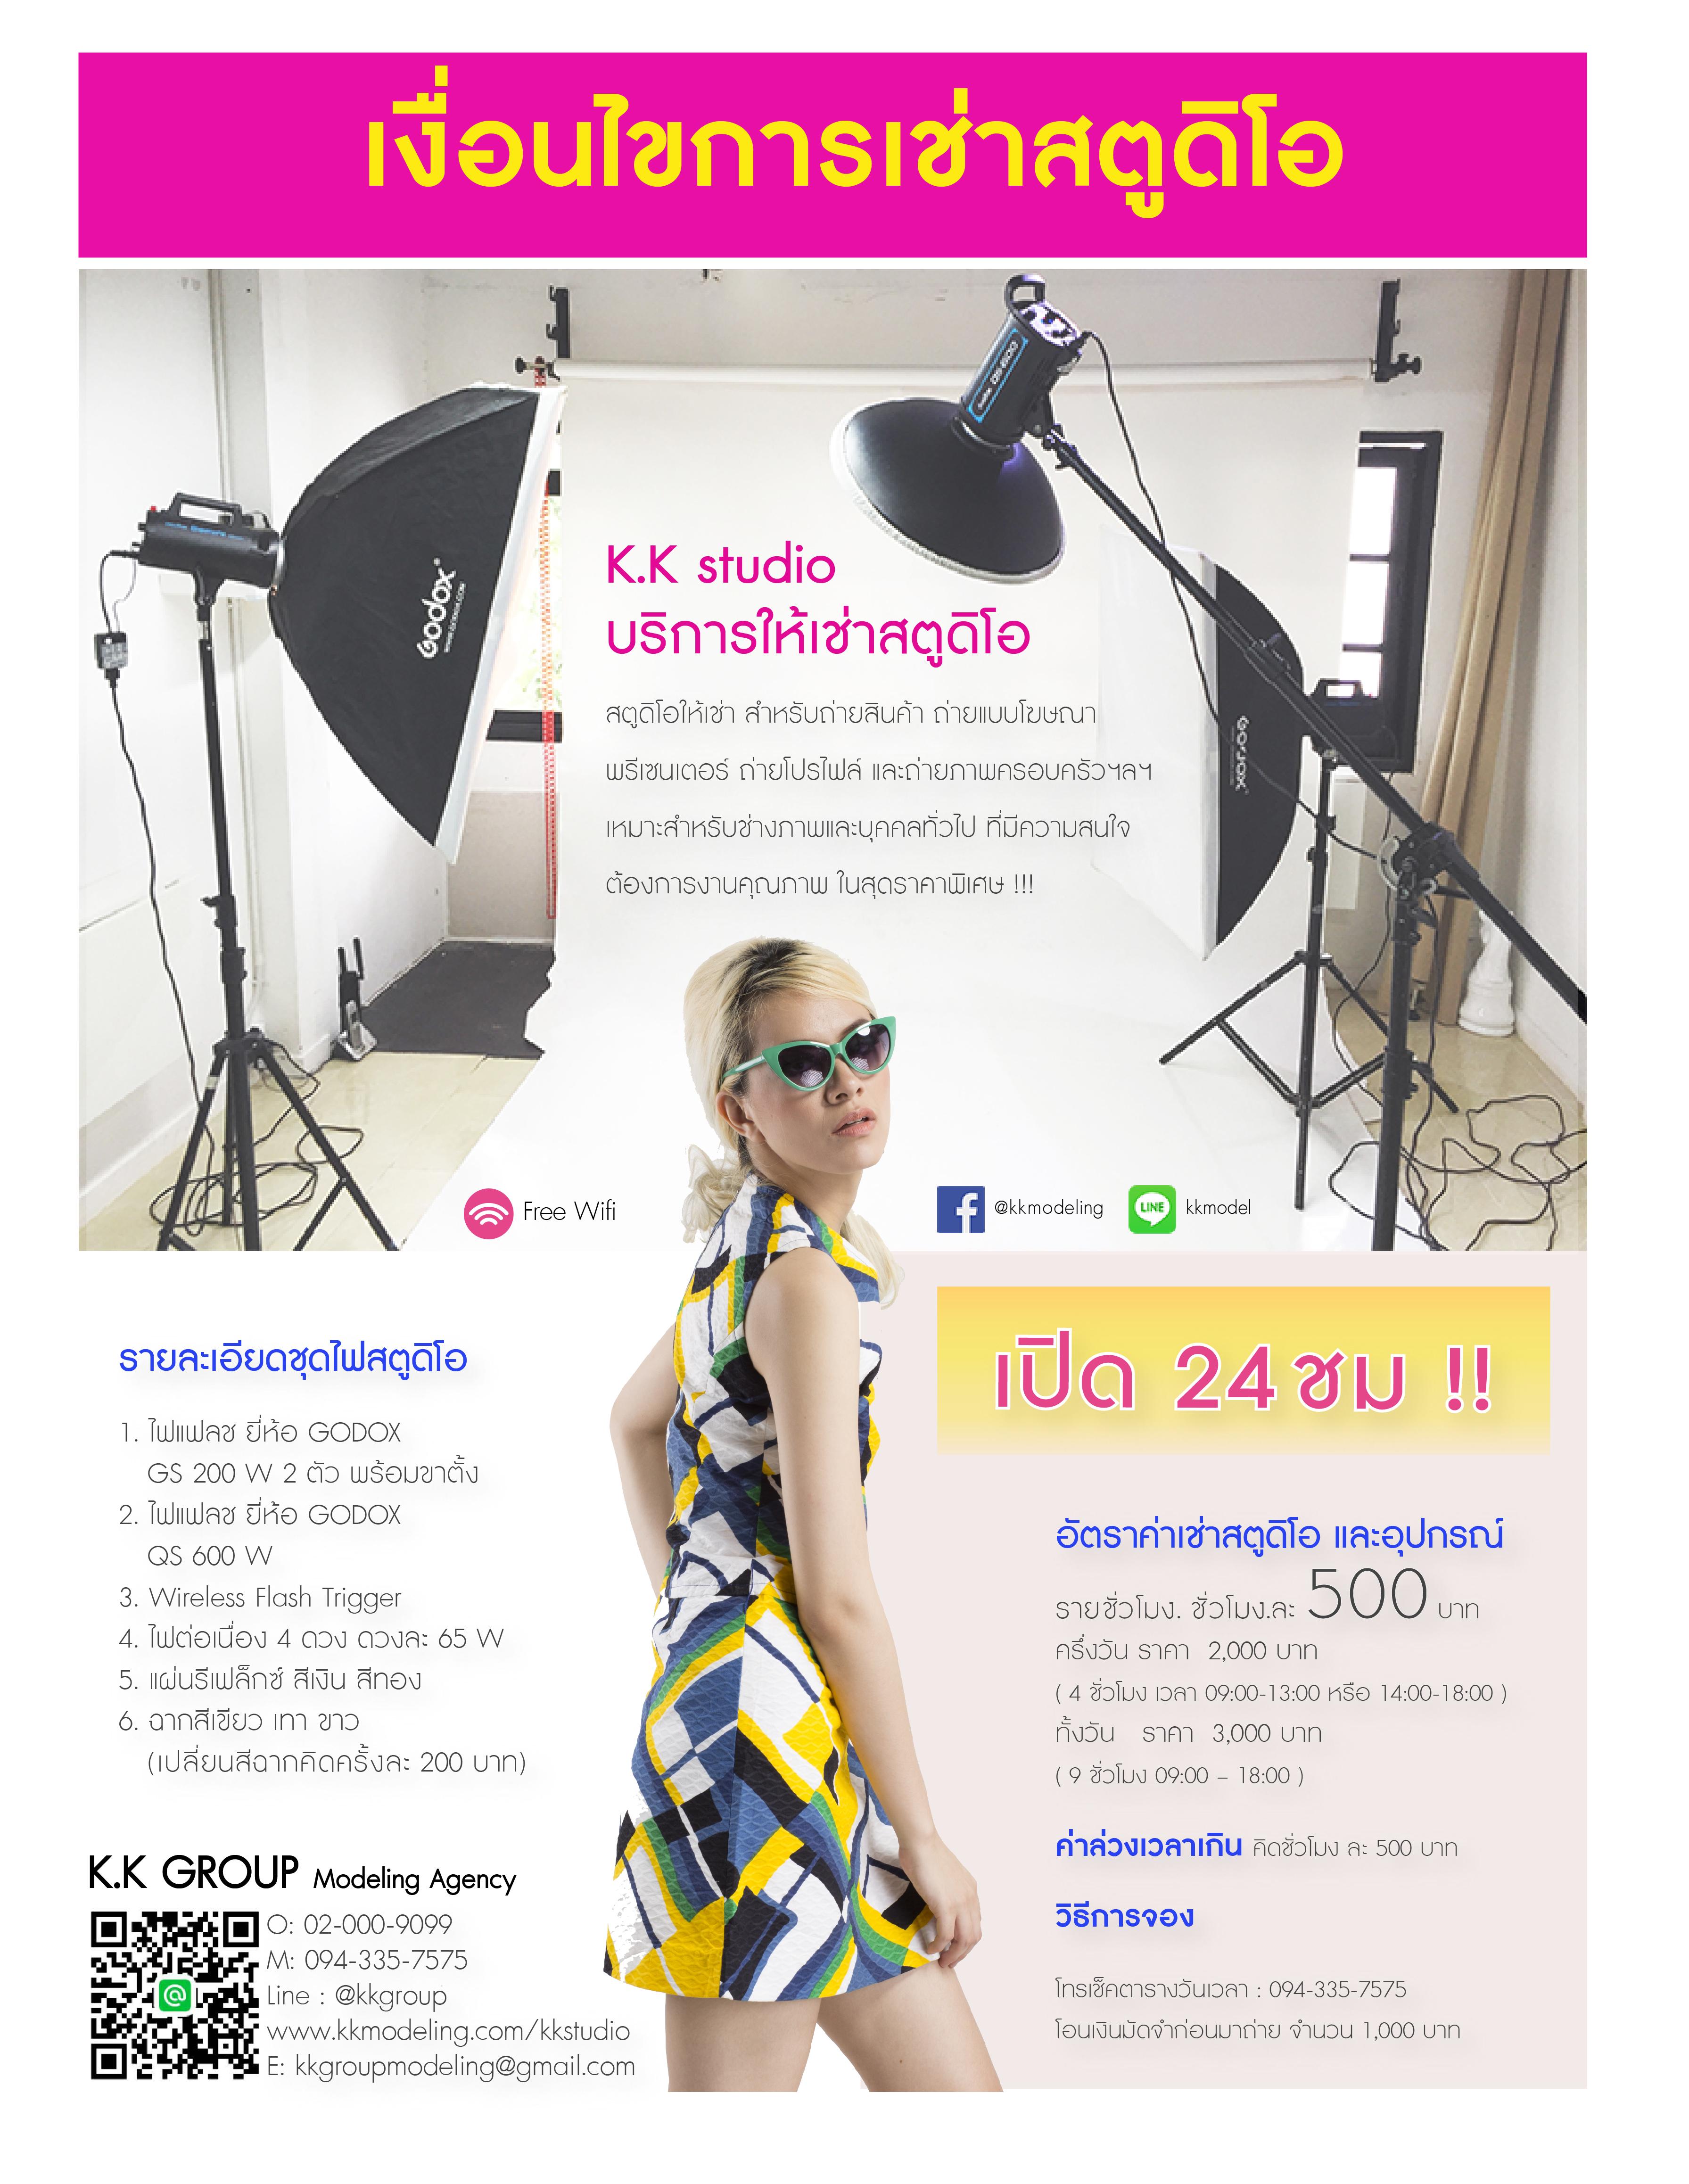 rent studio bangkok thailand เช่าสตู ราคาถูก